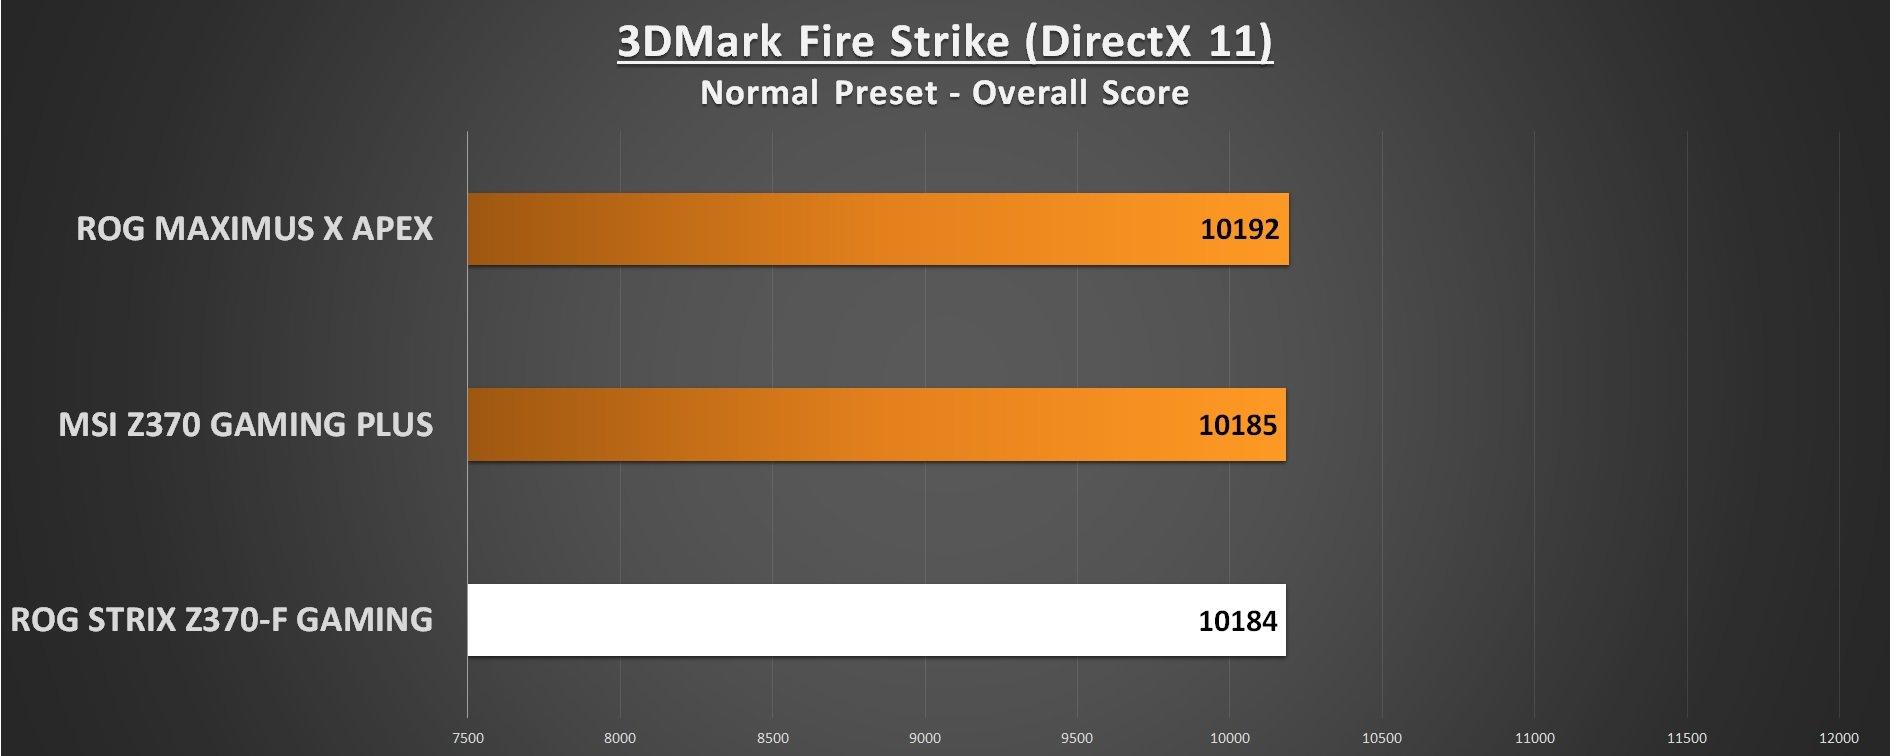 ROG STRIX Z370-F Gaming 3DMark Fire Strike